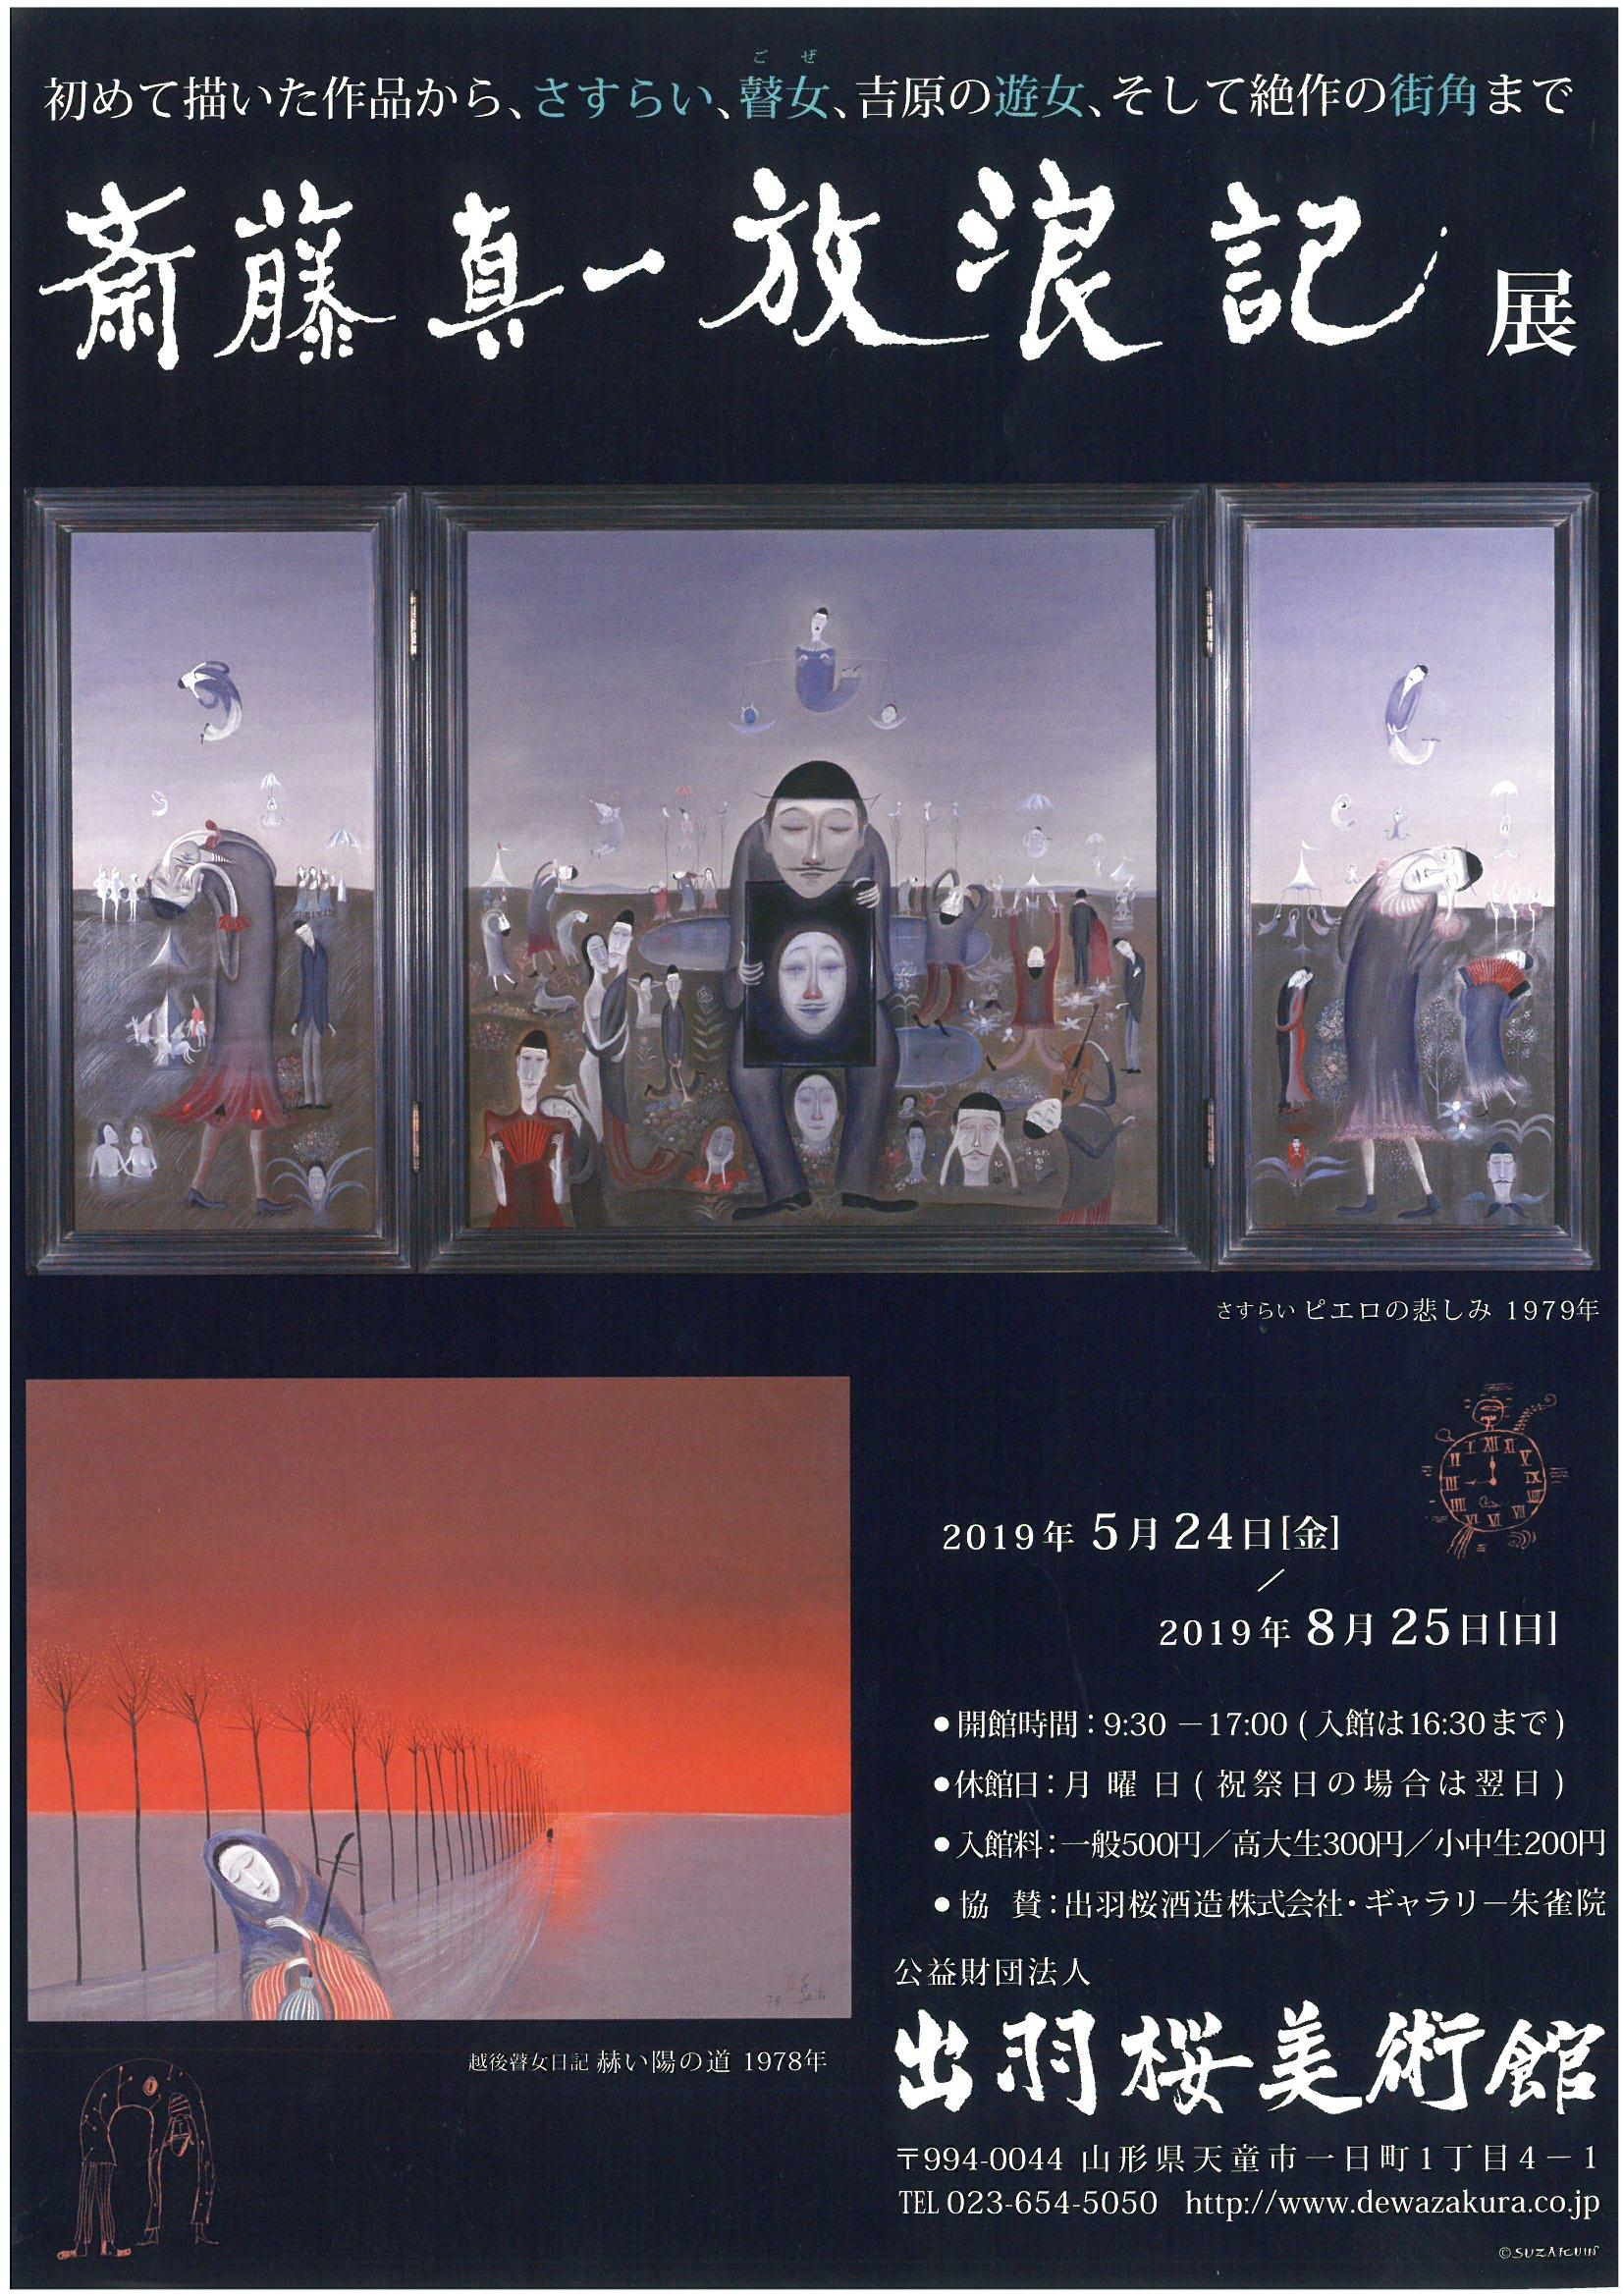 museum2019-2-1.jpg